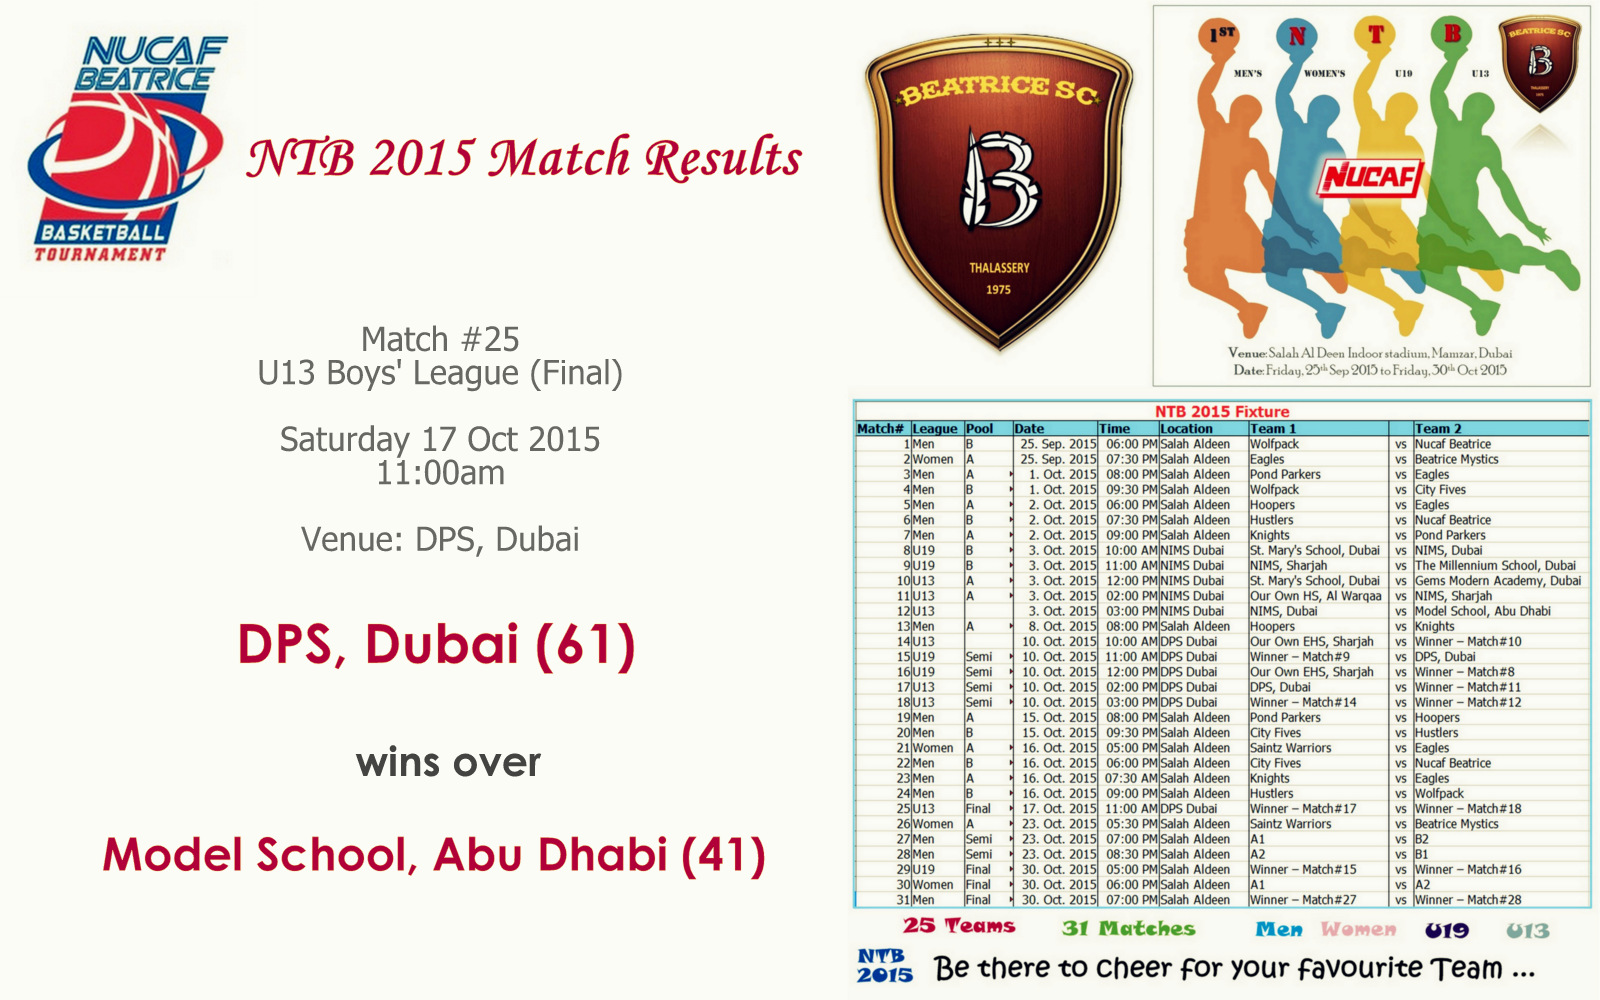 NTB 2015 – Match #25 (U13 Final) | DPS, Dubai (61) Vs Model School, Abu Dhabi (41)